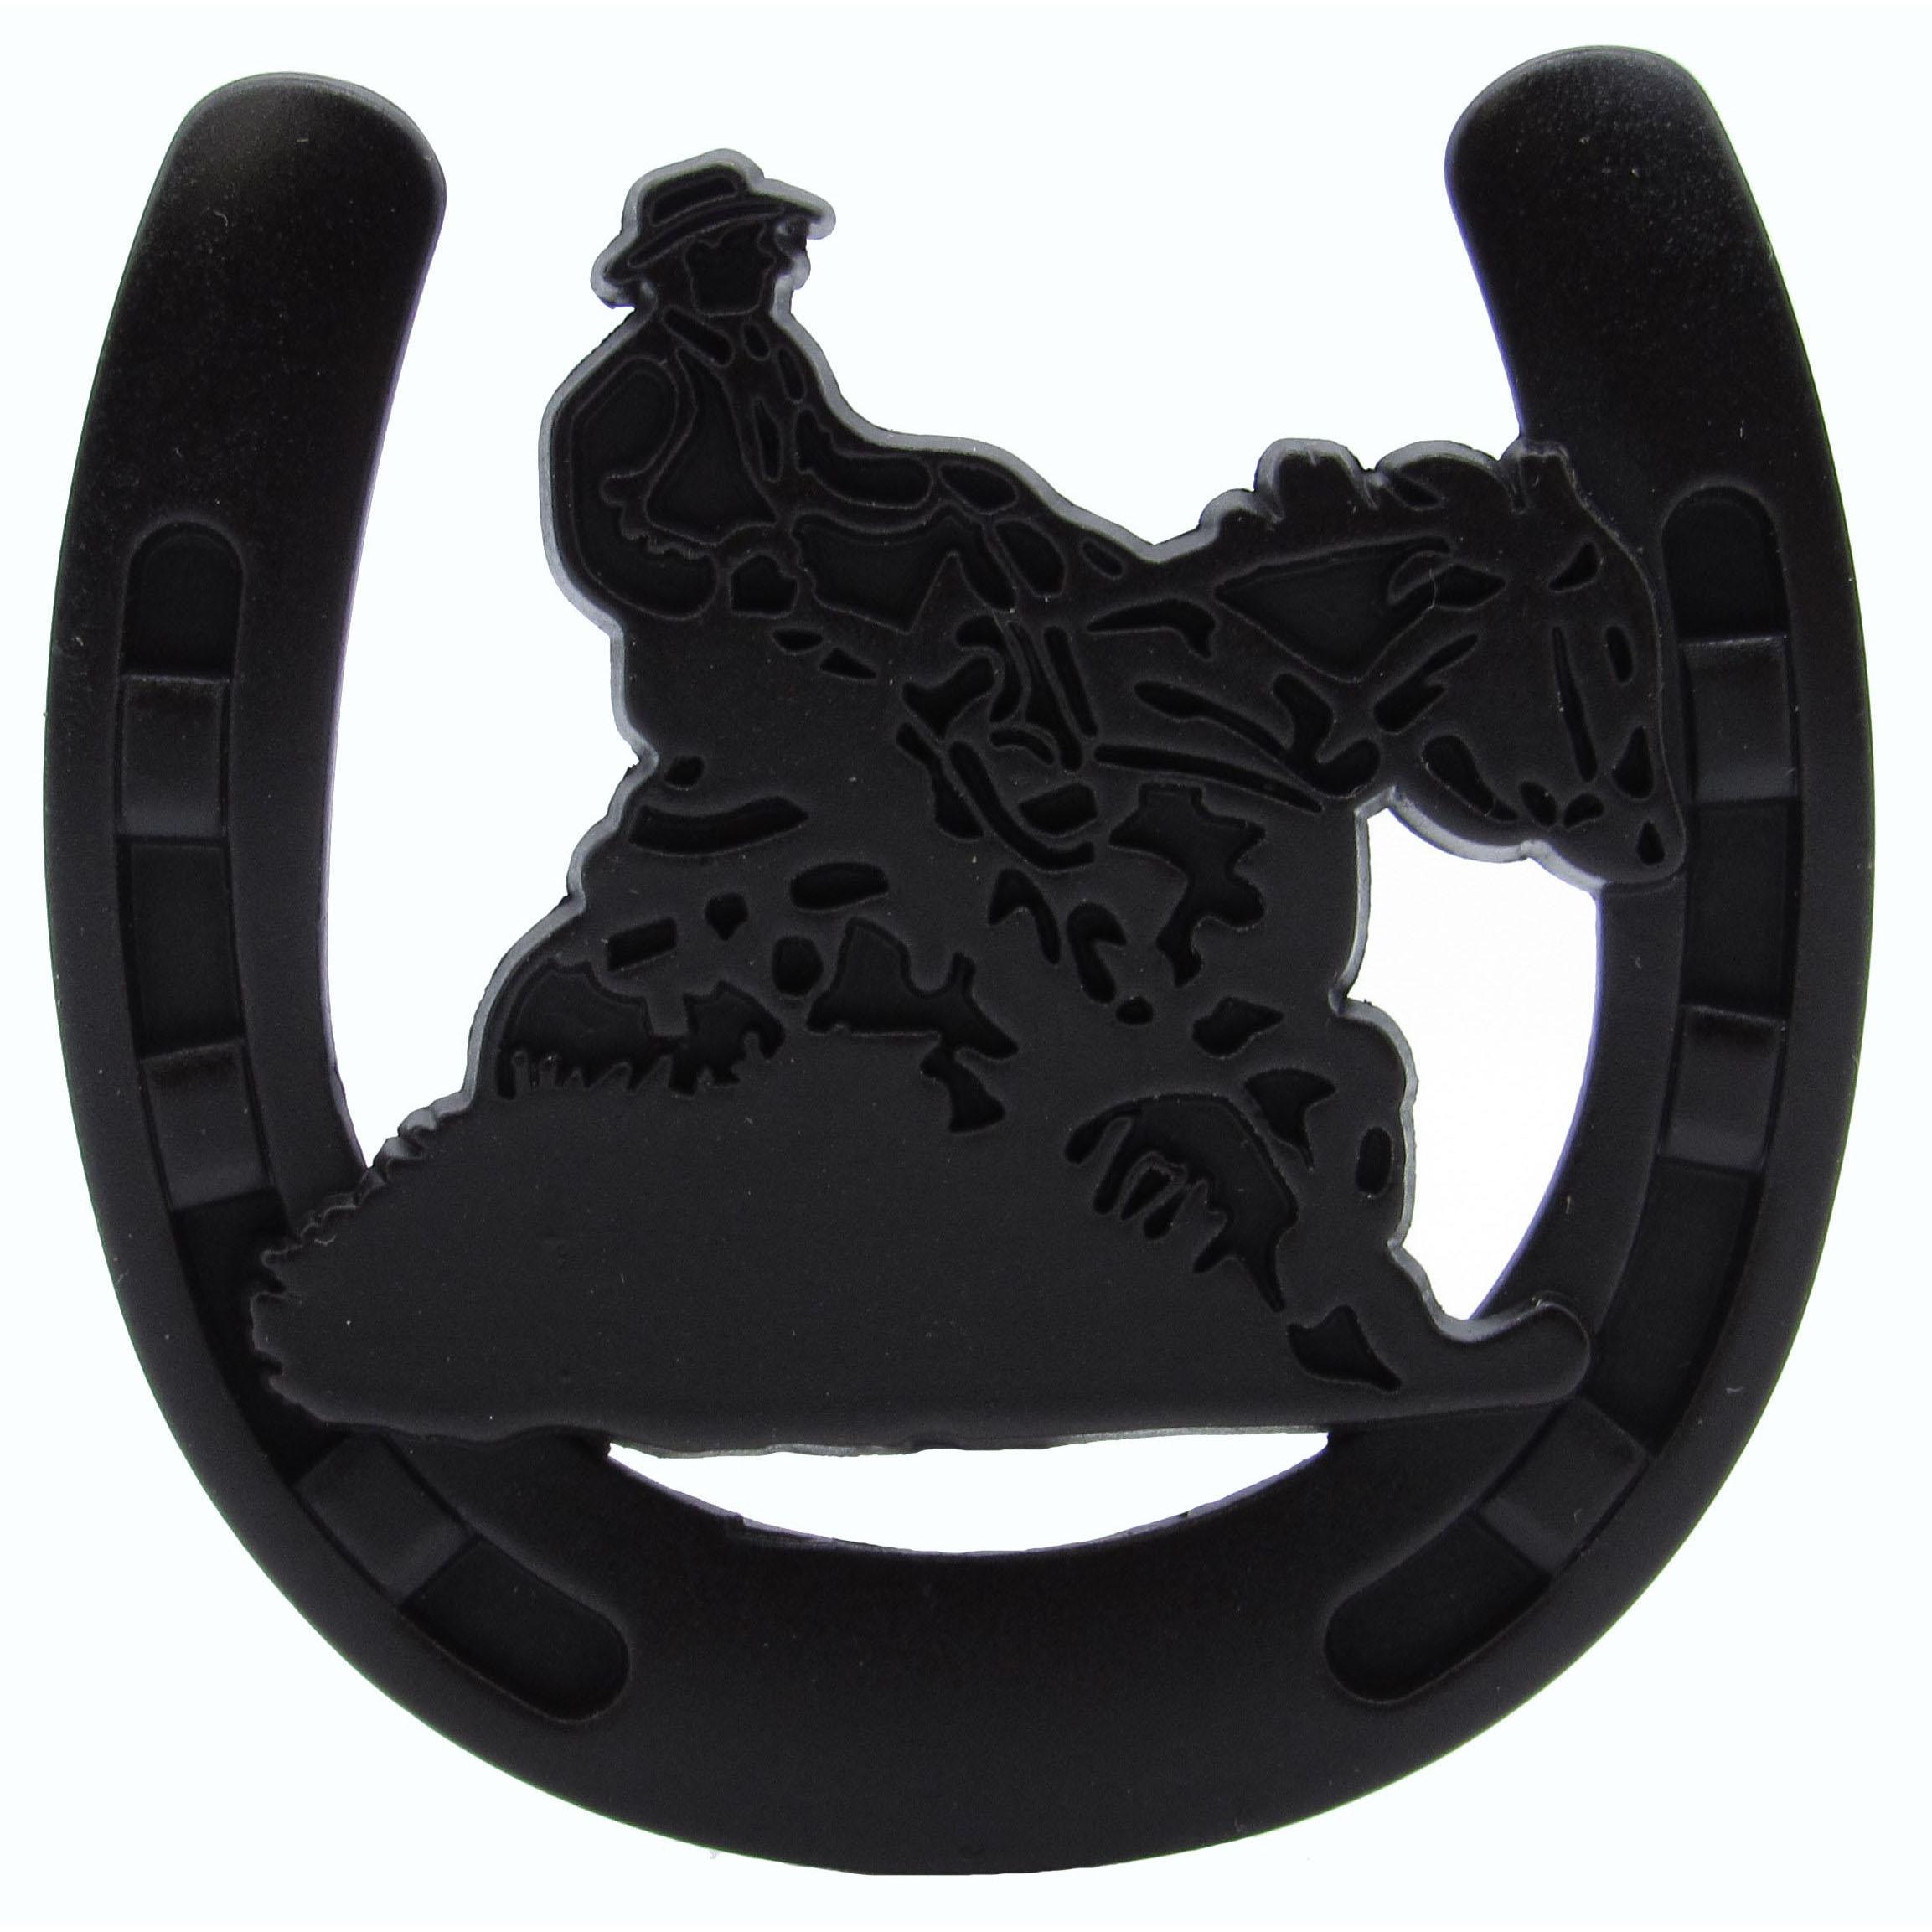 Riding Cowboy Horseshoe Knob, Oil Rubbed Bronze